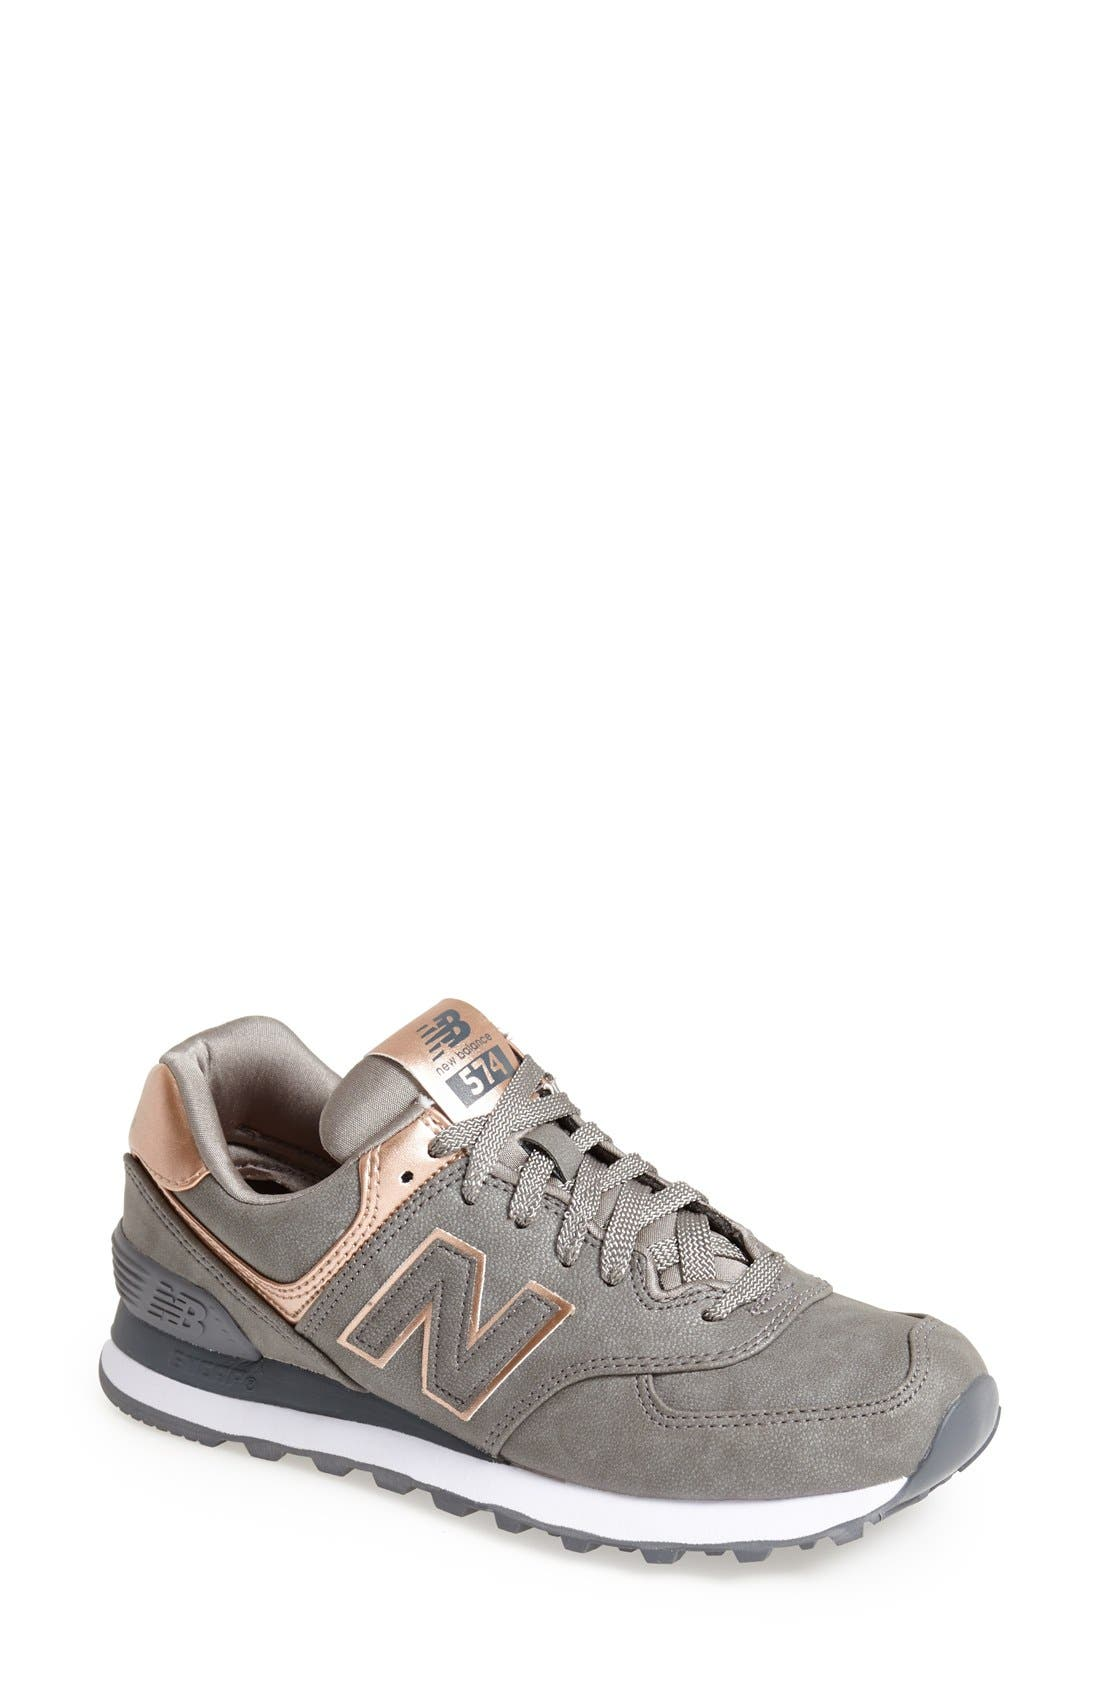 '574 - Precious Metals' Sneaker,                             Main thumbnail 1, color,                             040